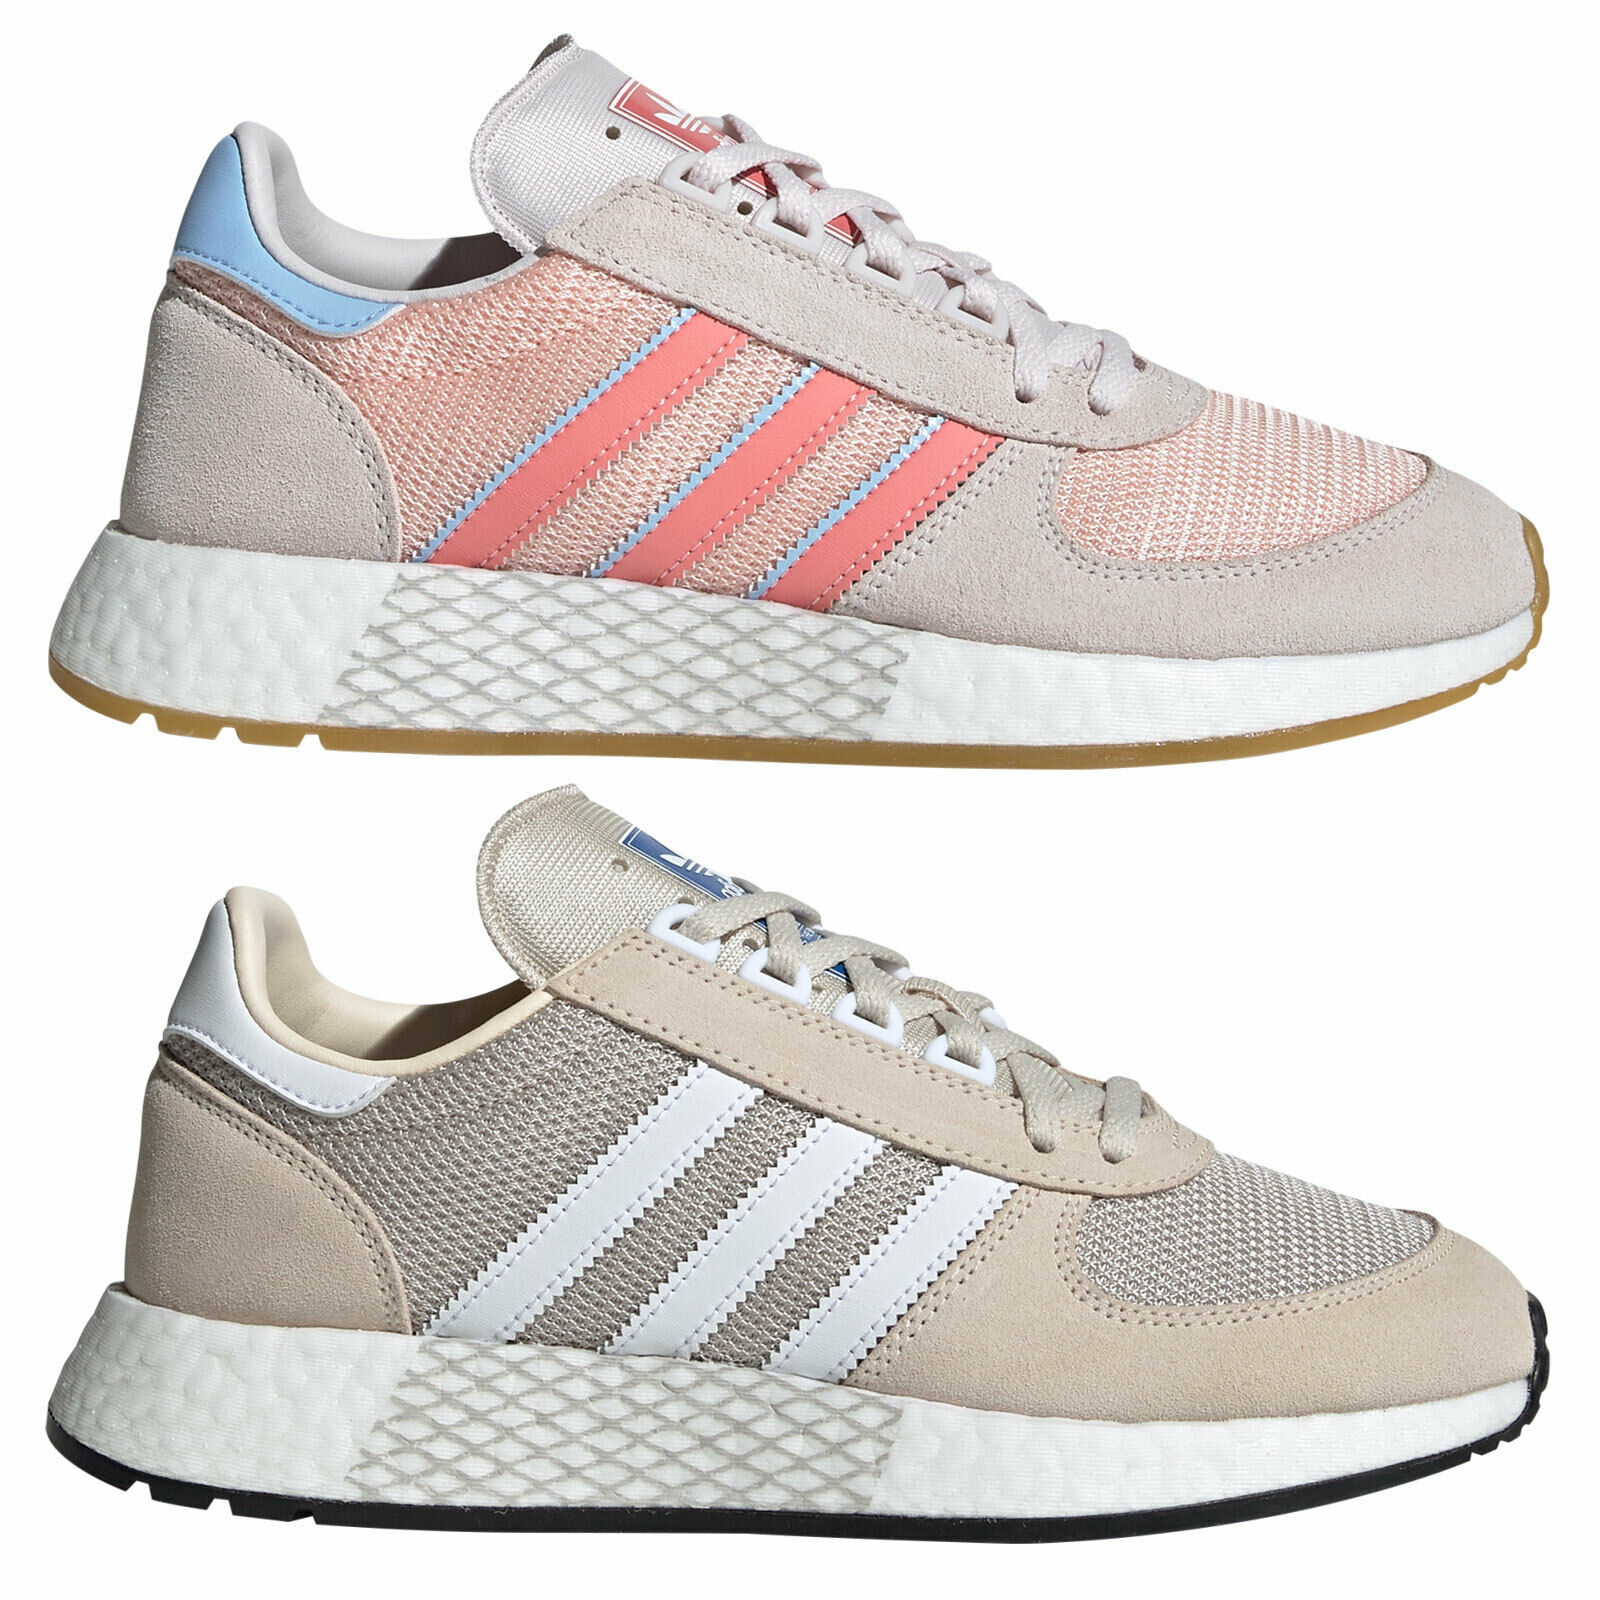 adidas Originals Marathon Tech Damen Turnschuhe Schuhe Turnschuhe Sportschuhe Retro